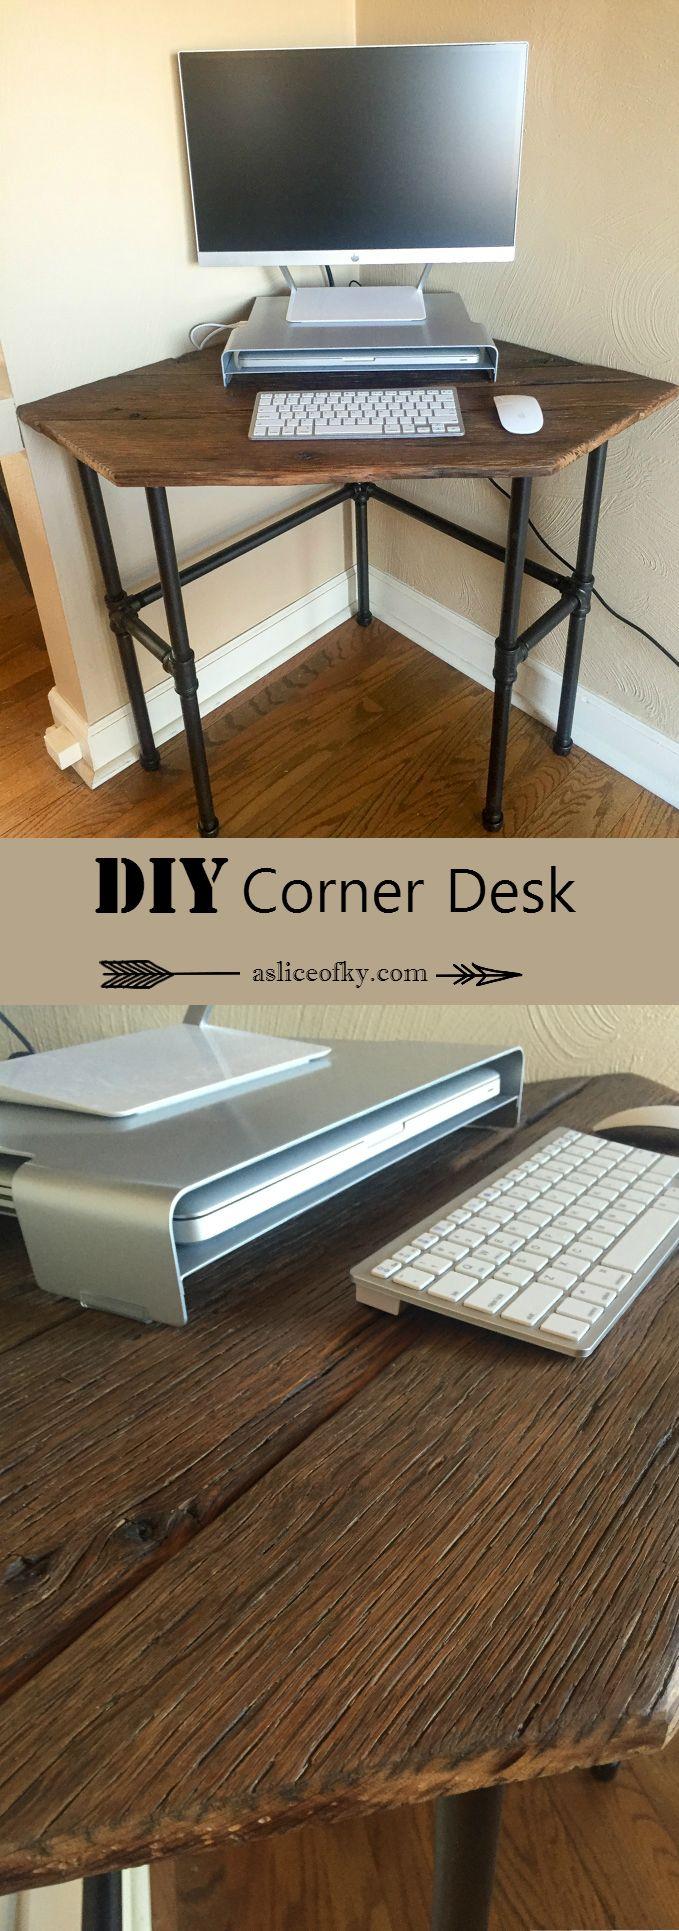 DIY Corner Desk | Step By Step Instructions | A Slice Of Ky